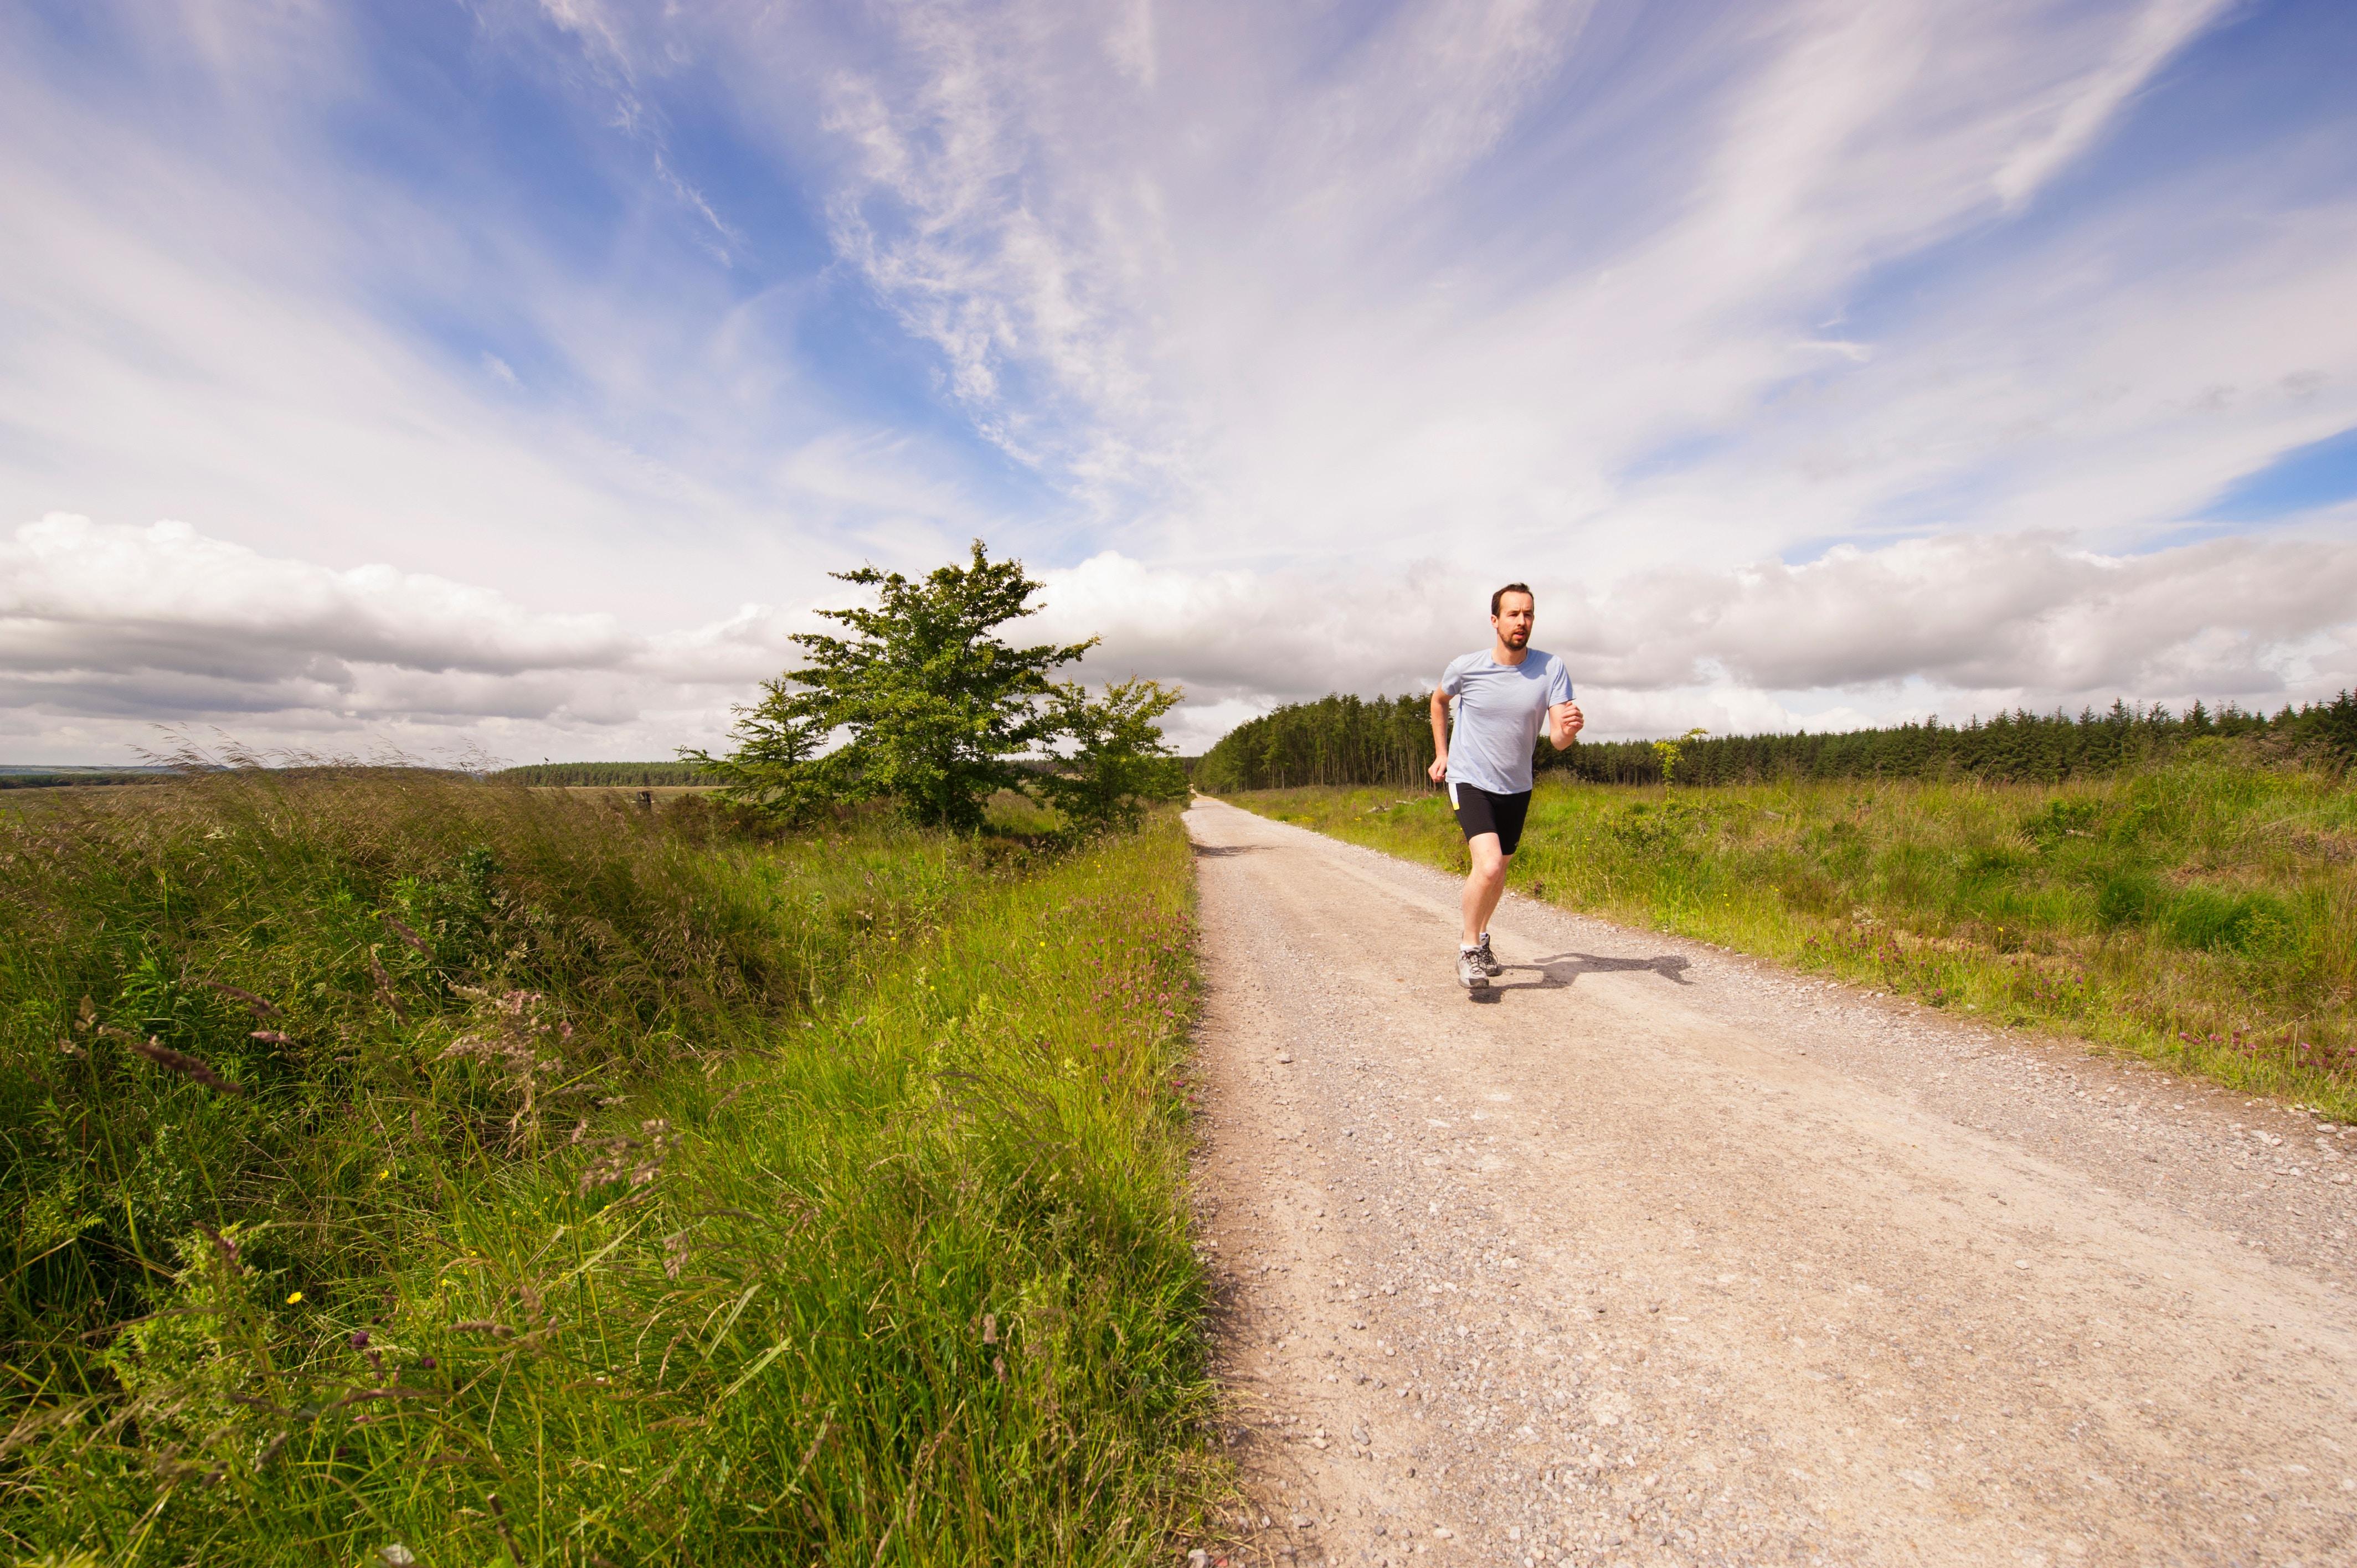 man exercise run outdoors